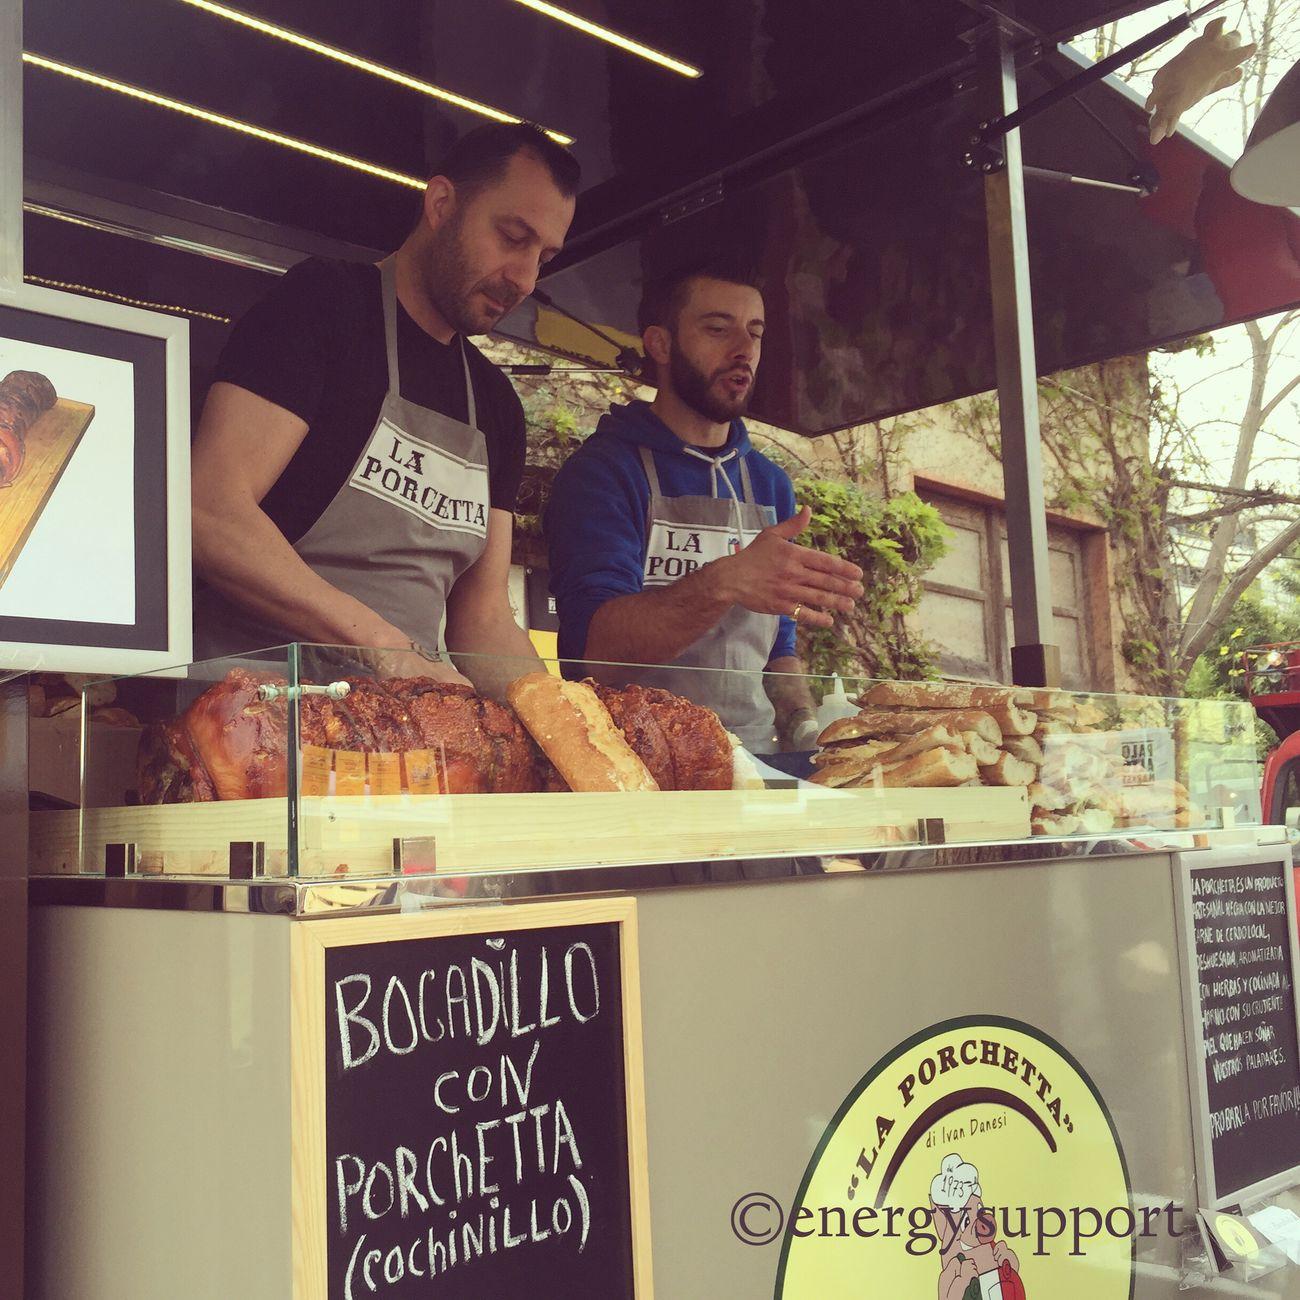 #PaloAltoMarket 👍👍👍Distribuidor PorchettaIvan Danesi- Davide - Isacco 📞+34 633 134 760 📧 laporchettartesanal@gmail.com #compartir los #conocimientos🍴 😉 👉 de #gastrónoma 🍴👉 a #gastrónomo 😉 #blog #follow #danielarbos #laporchetta #tradicion #artesanal #proveedor #foodtruck #foodvespa #instafood #streetmarket @energysupport 😋 @paloaltomarket #barcelona #catalonia #catering #eventos #sandraenergysupport #paladar #delicious #italy #abril #weekend 📷 Photo Credit: Sandra_EnergySupport Paloaltomarket Foodtruck Instafood Streetmarket Gastronomy Laporchetta Porchetta  Sandraenergysupport Friends Artesanal